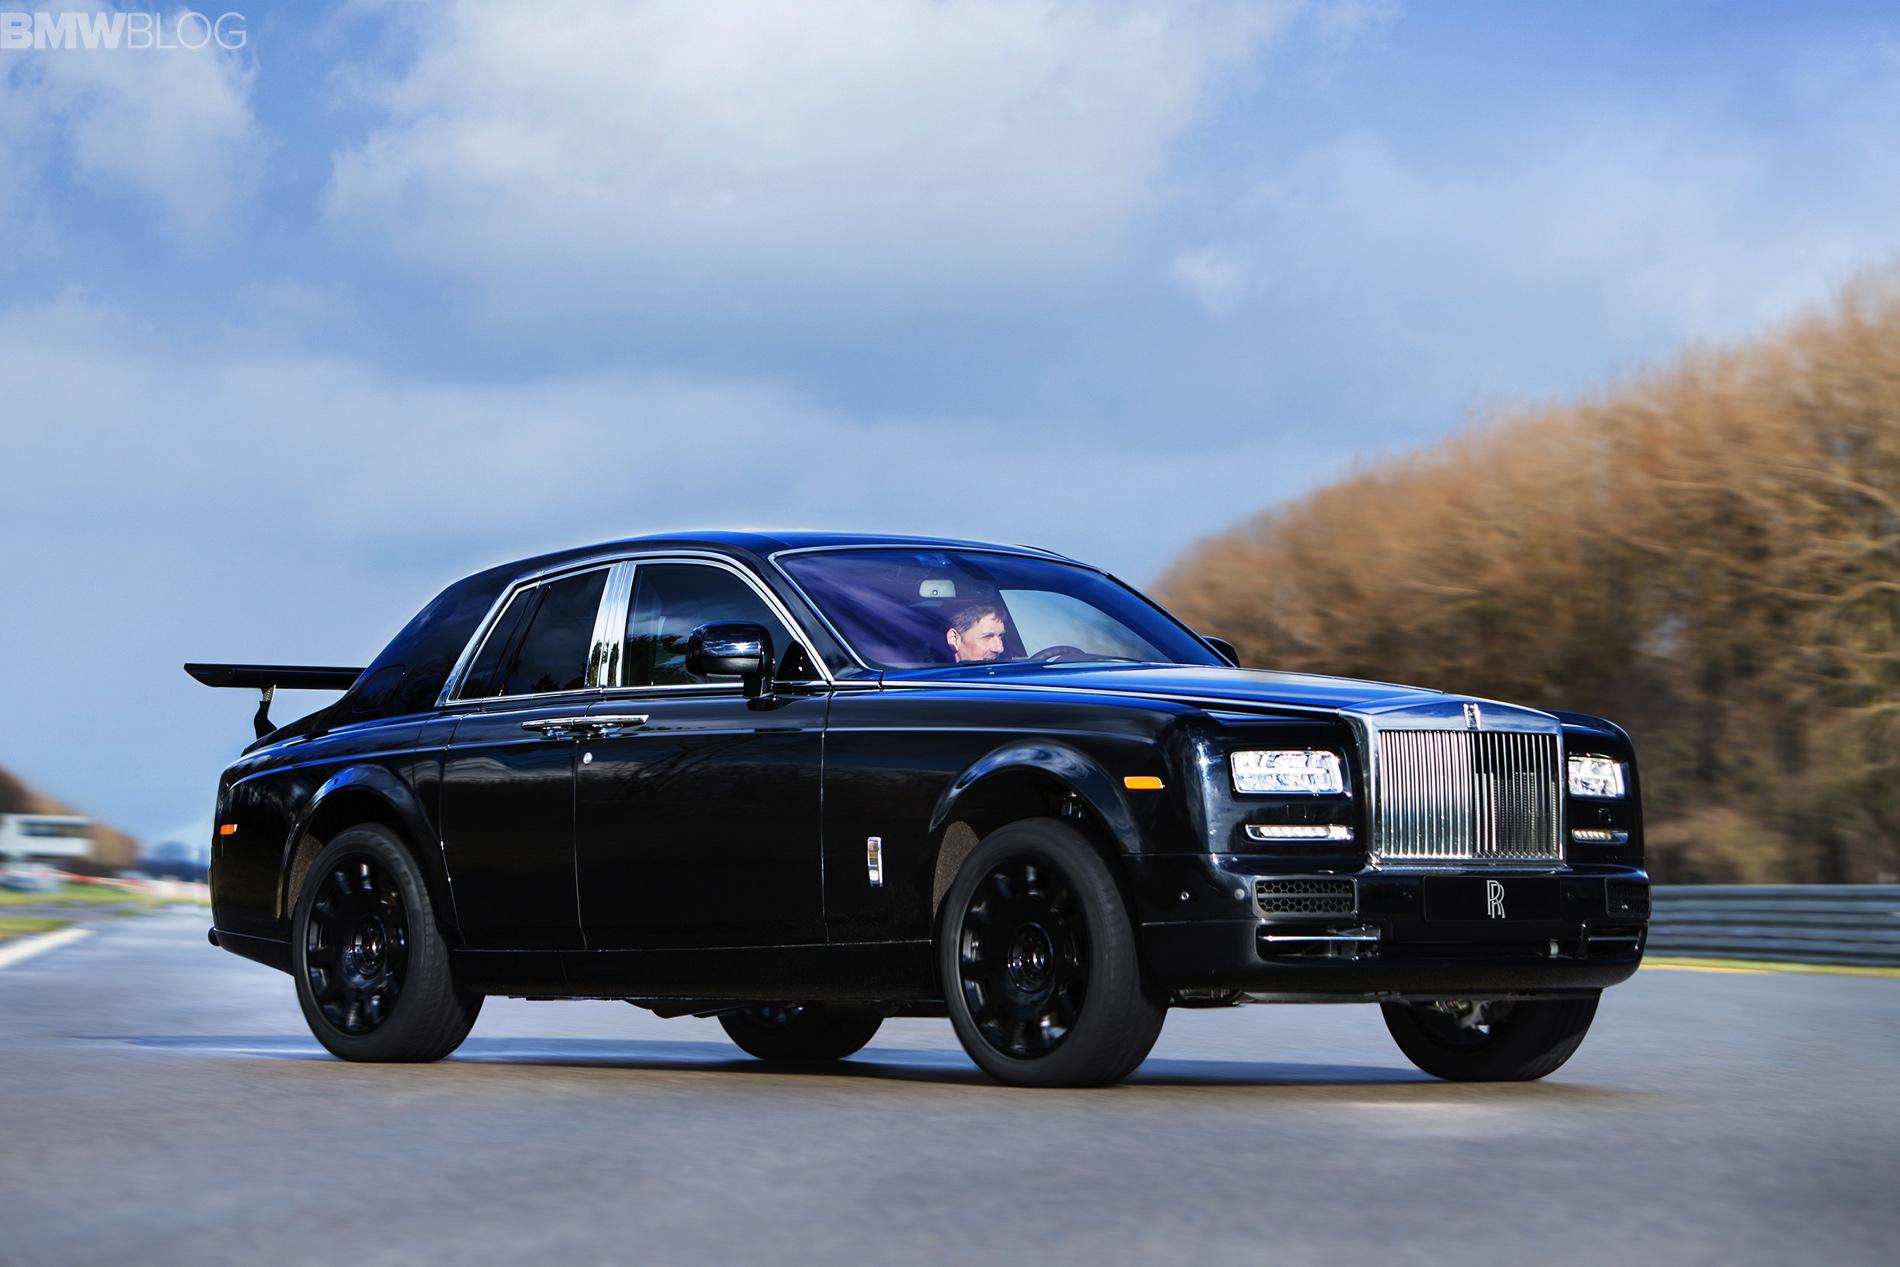 Rolls Royce Cullinan suv image 02